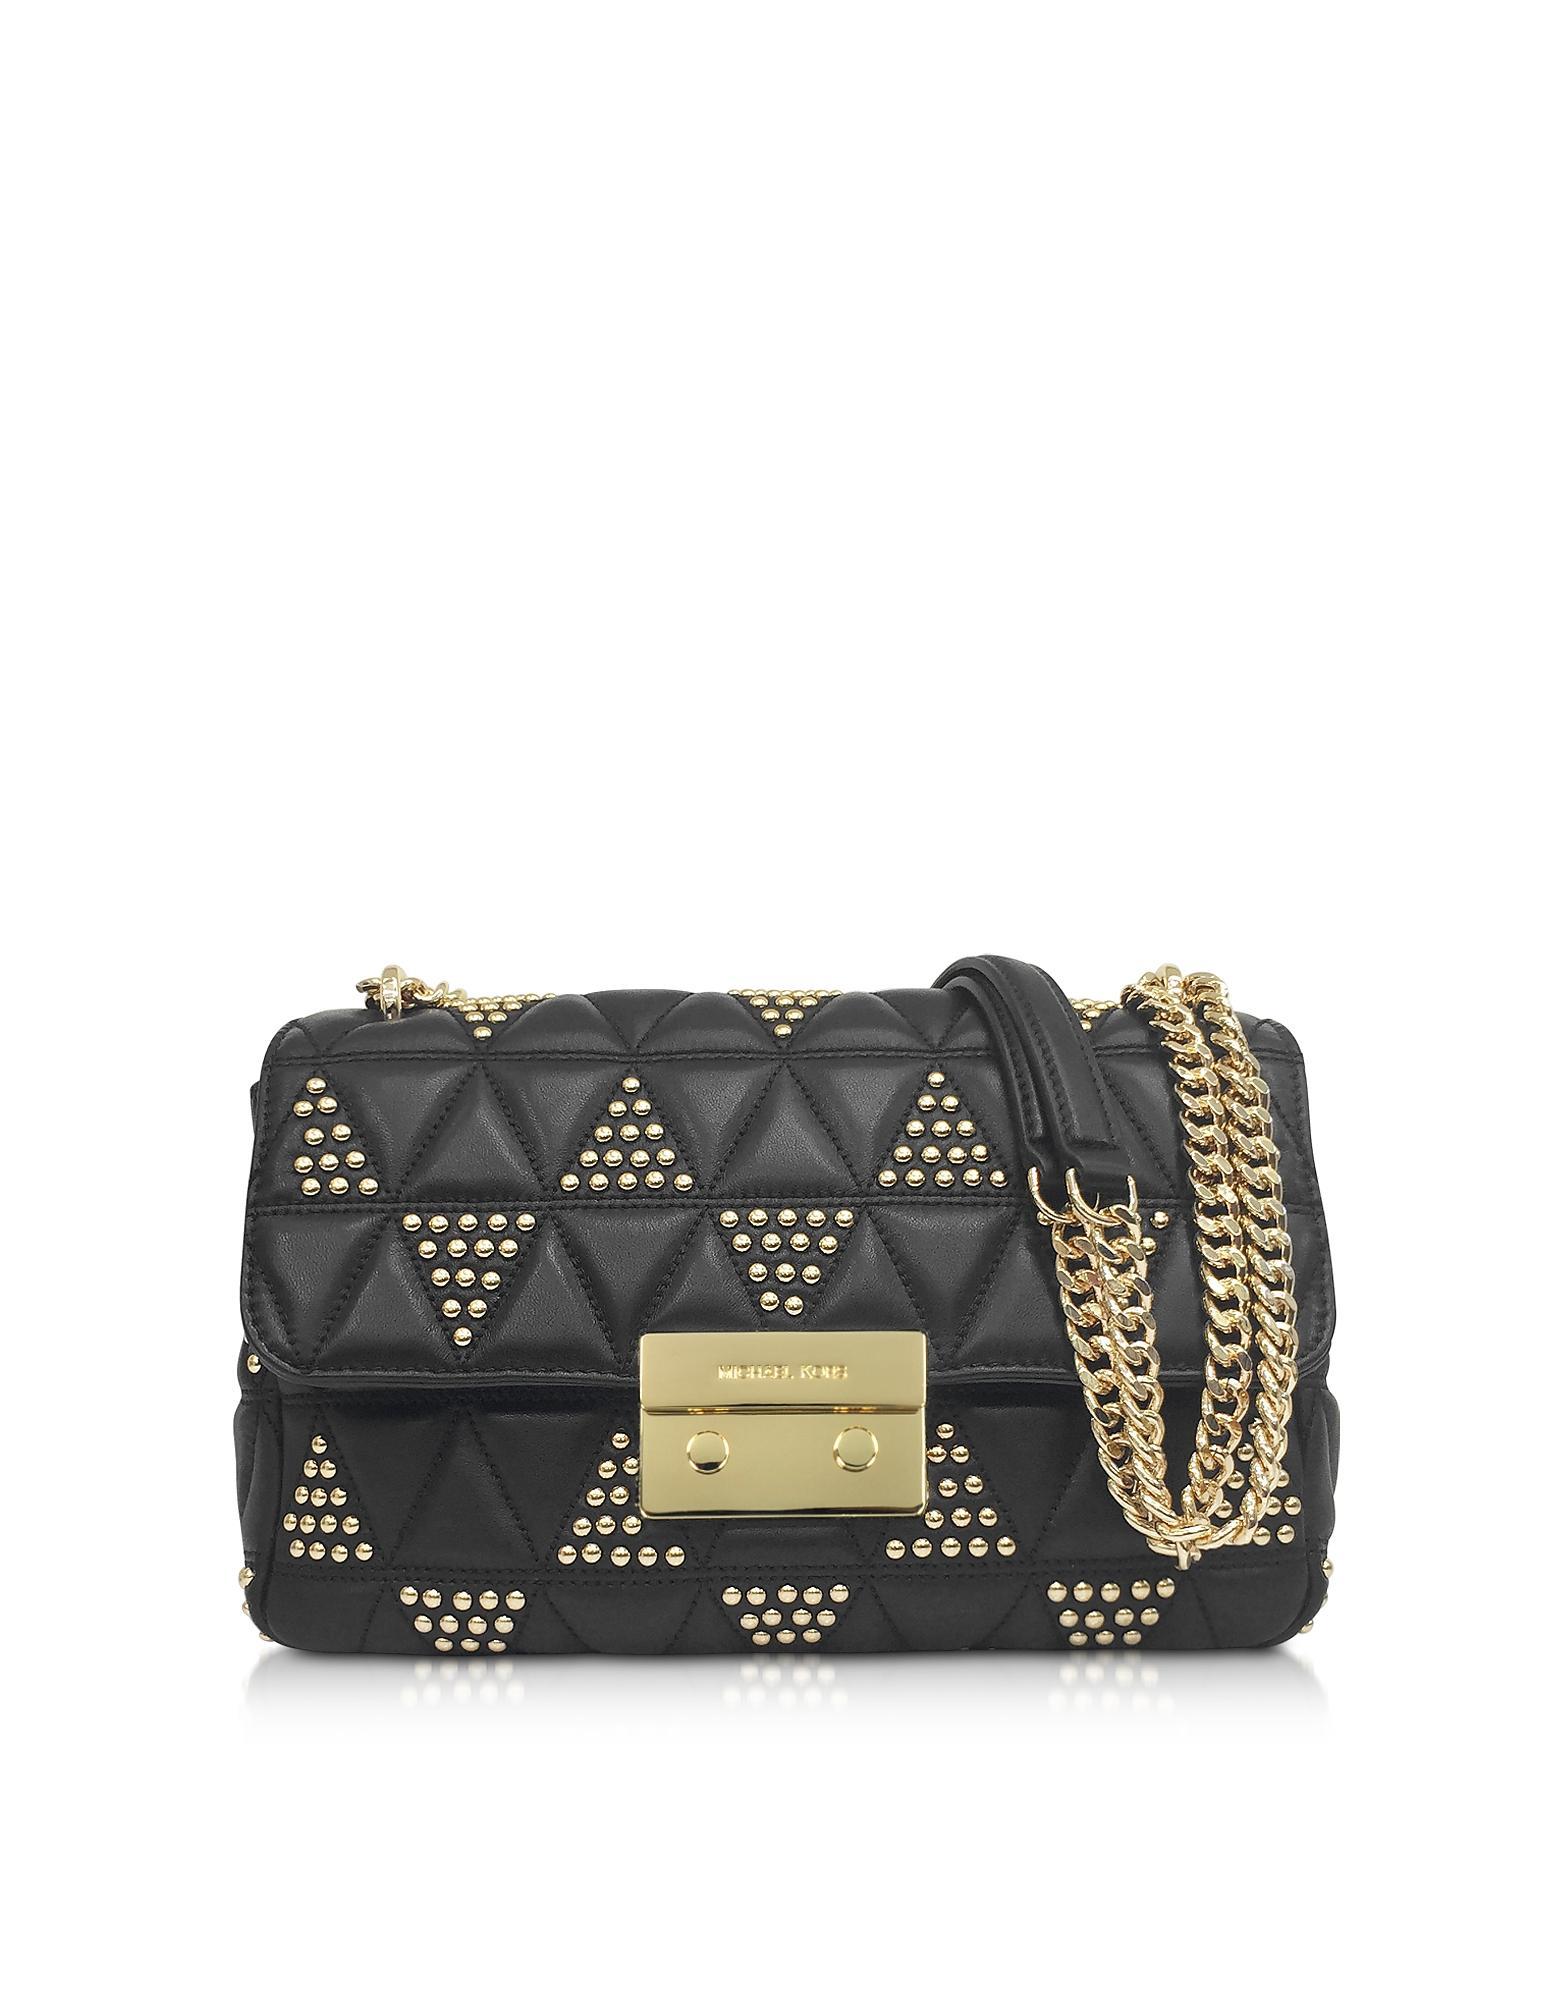 20b9c6401a14c3 Michael Kors Sloan Large Studded Leather Shoulder Bag In Black. FORZIERI